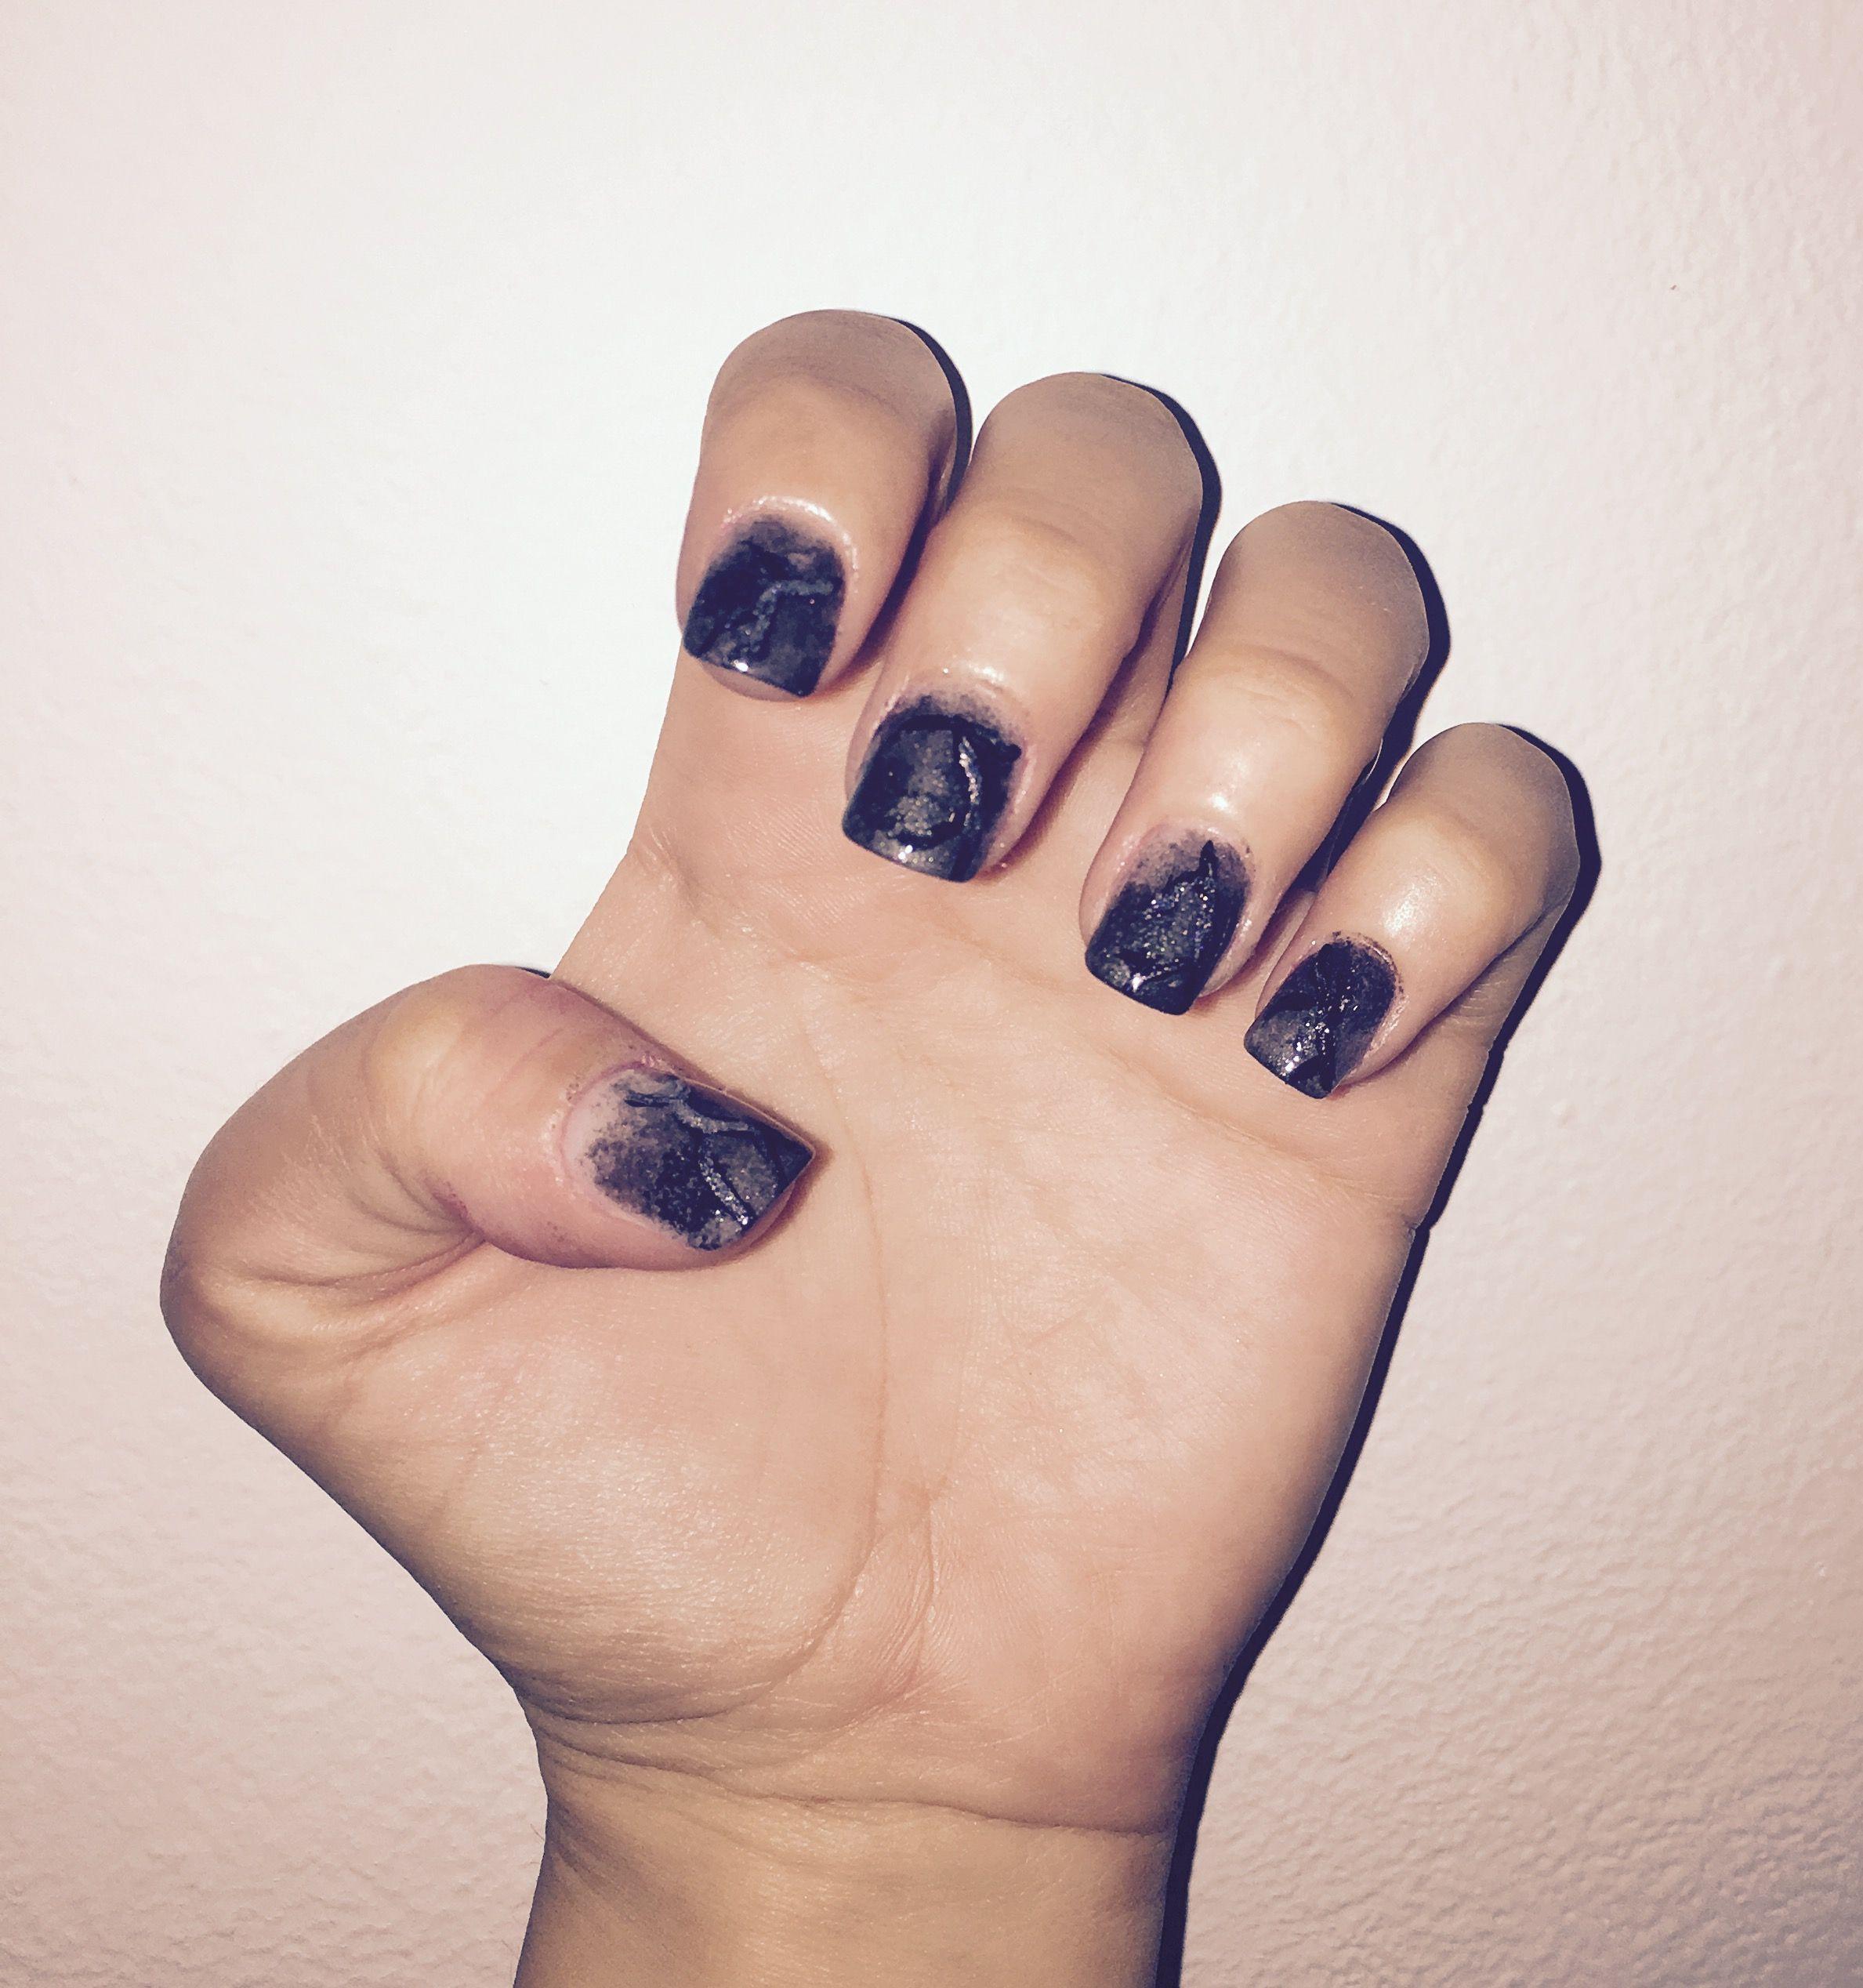 Mramor nail design Light gray + dark grey + black lines + silver ...